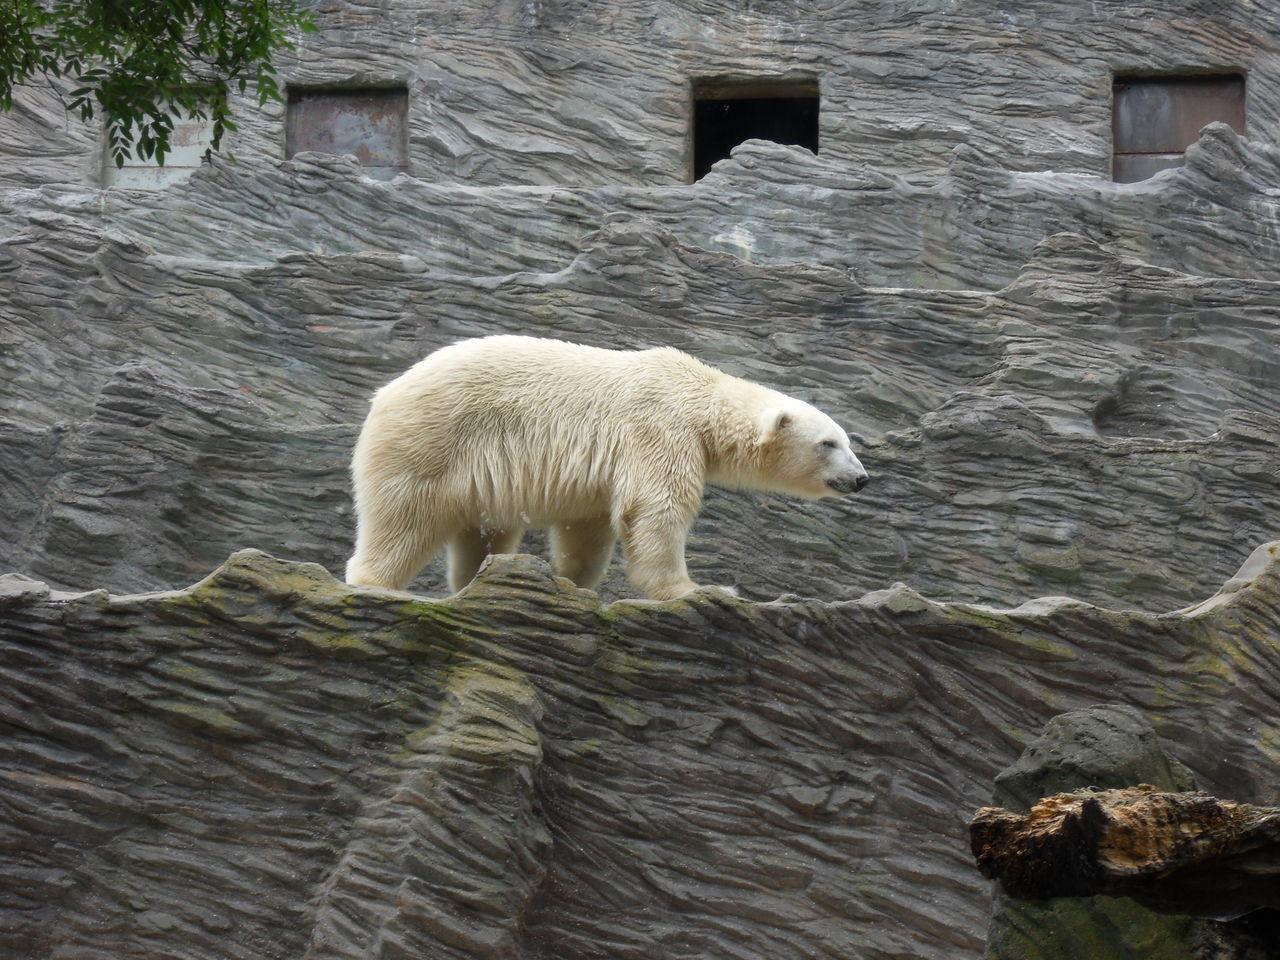 Bear walking on retaining wall